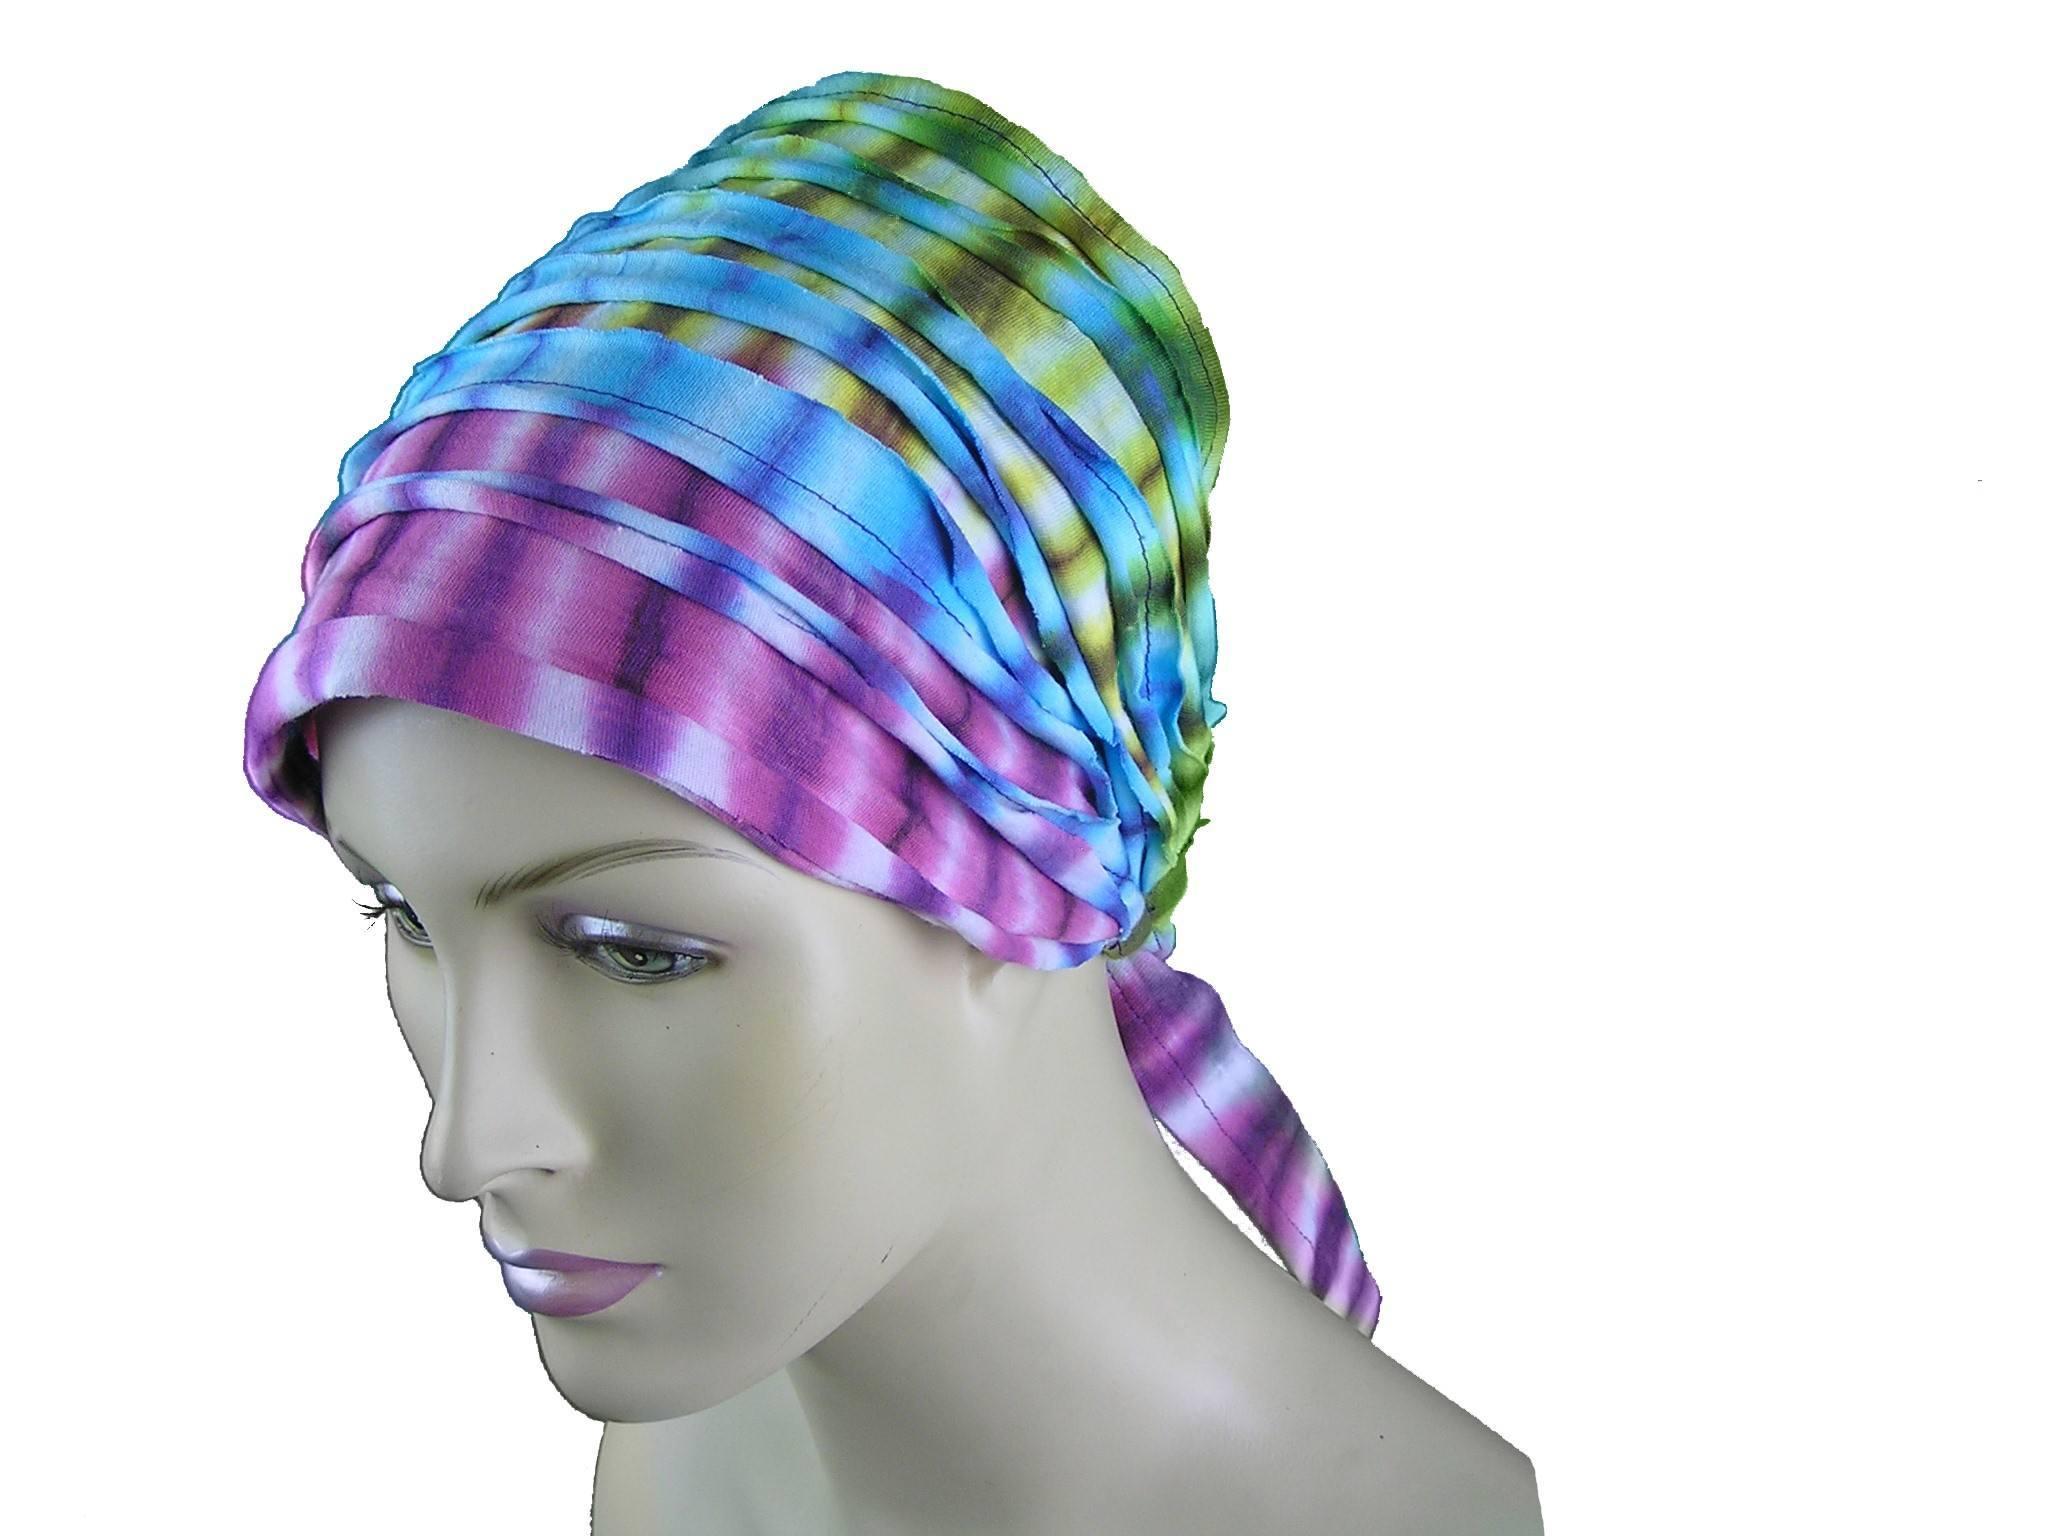 dea49a38dcdf6 Haarband Stirnband Batik Kopfband Kopftuch Haarschmuck Sport Yoga